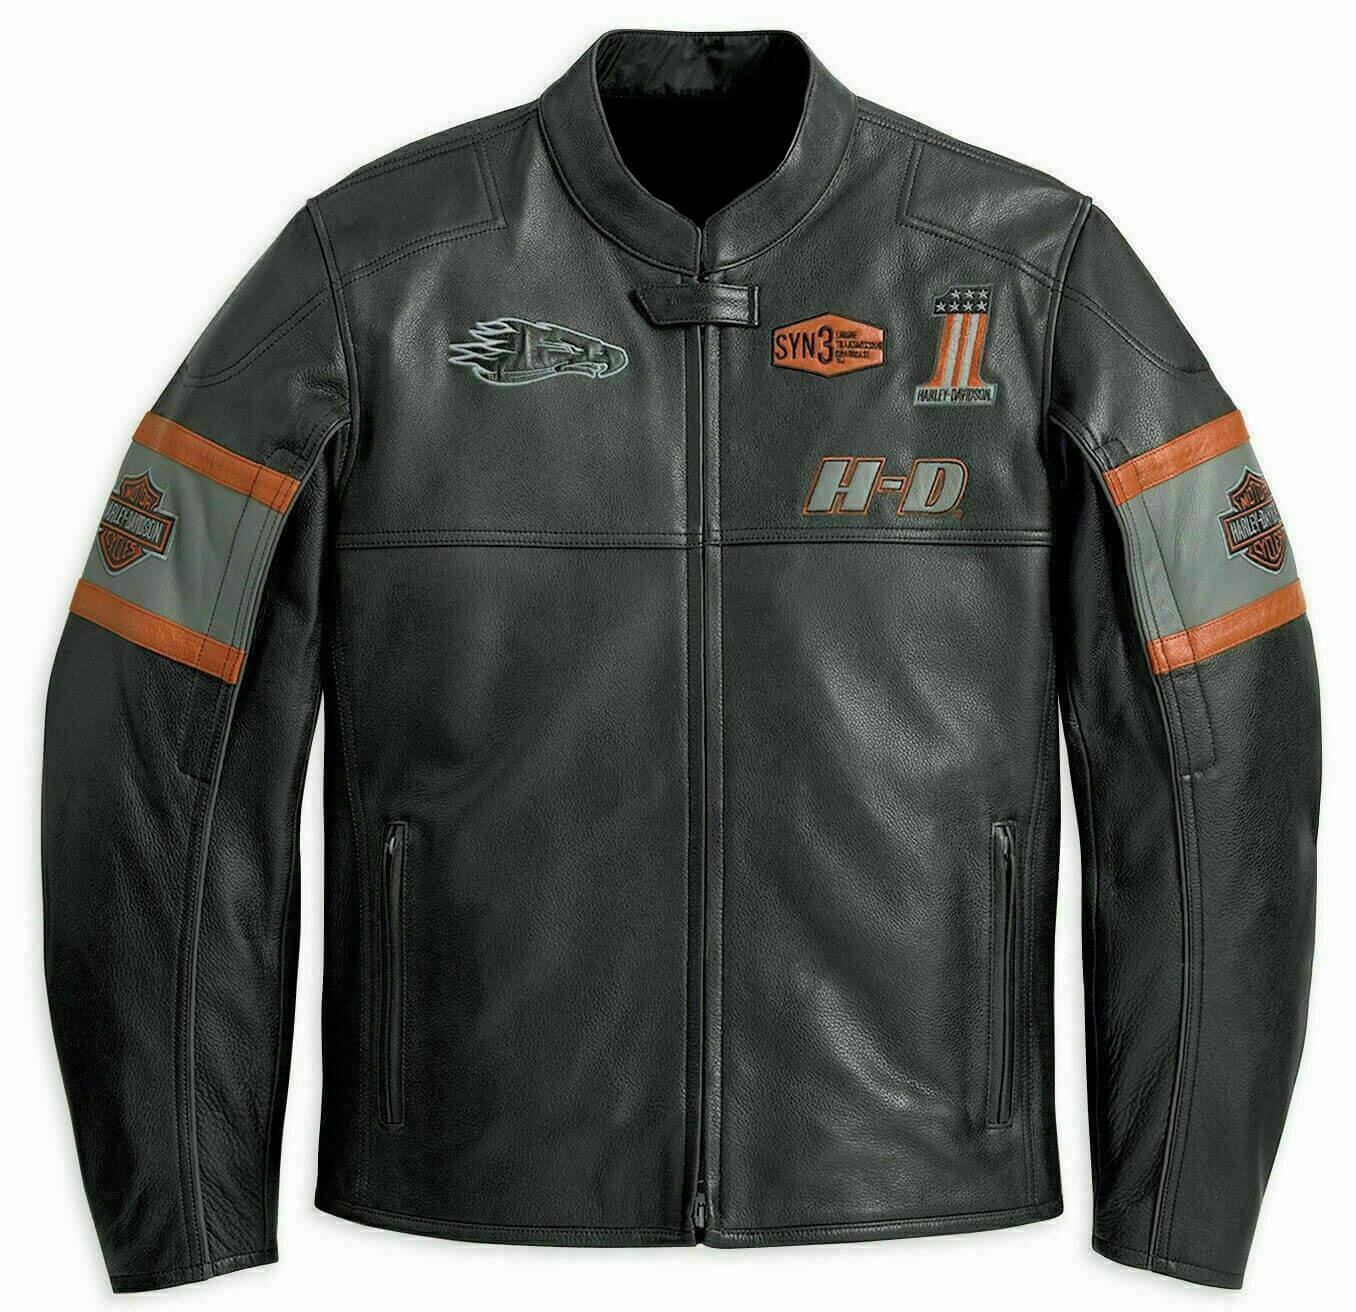 Harley Davidson Screaming Eagle Motorcycle Leather Jacket